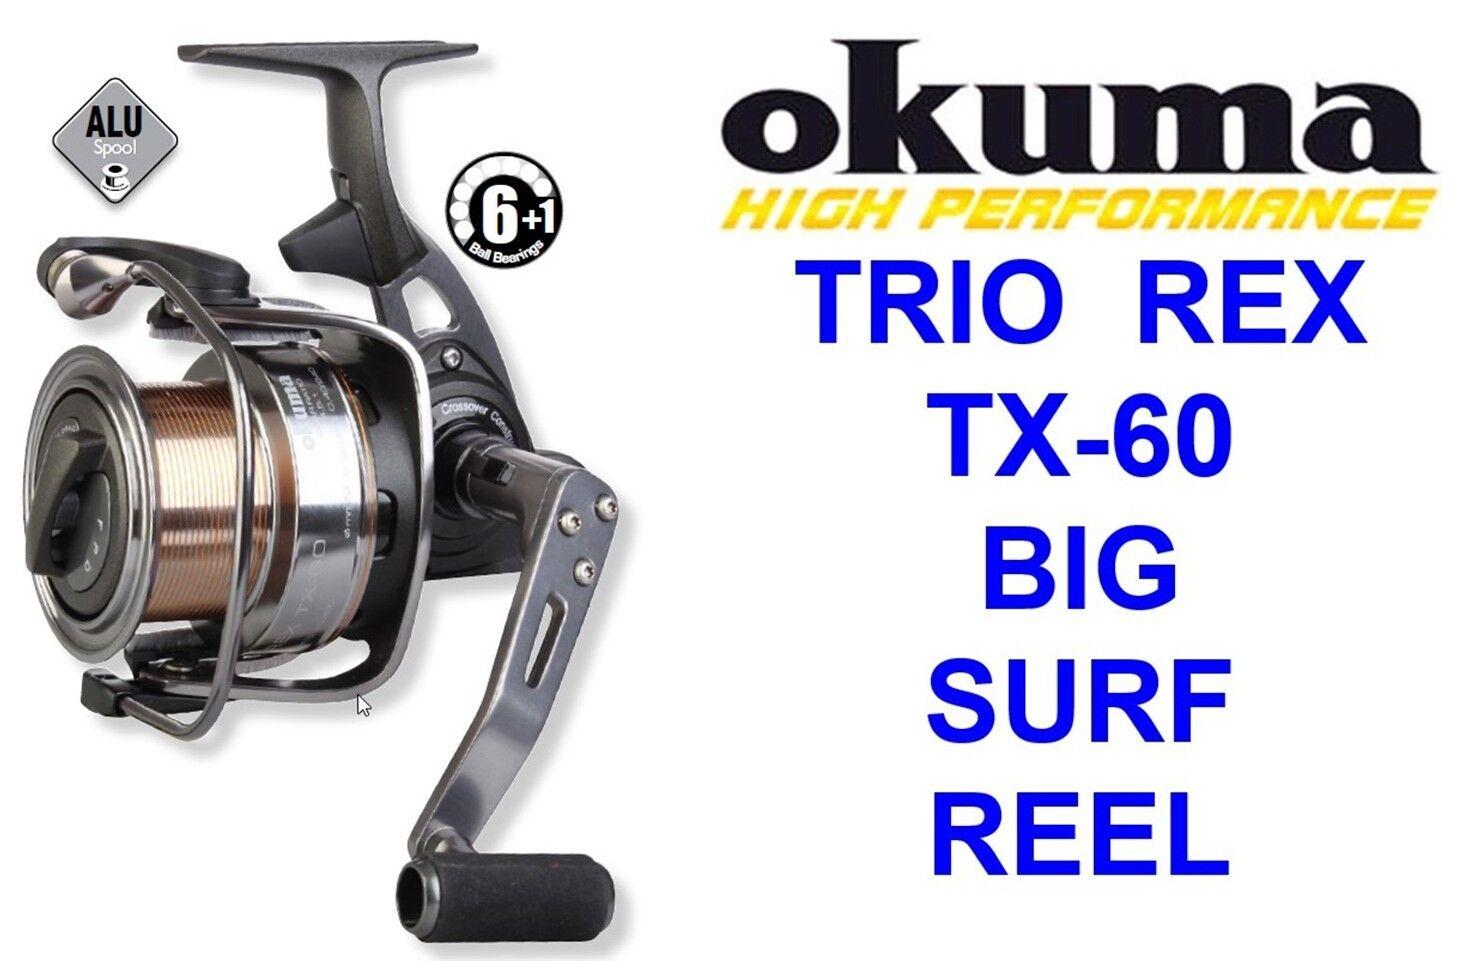 OKUMA TRIO REX TX-60 REEL BIG PIT FOR SEA DISTANCE SURF SPOD MARKER ROD FISHING